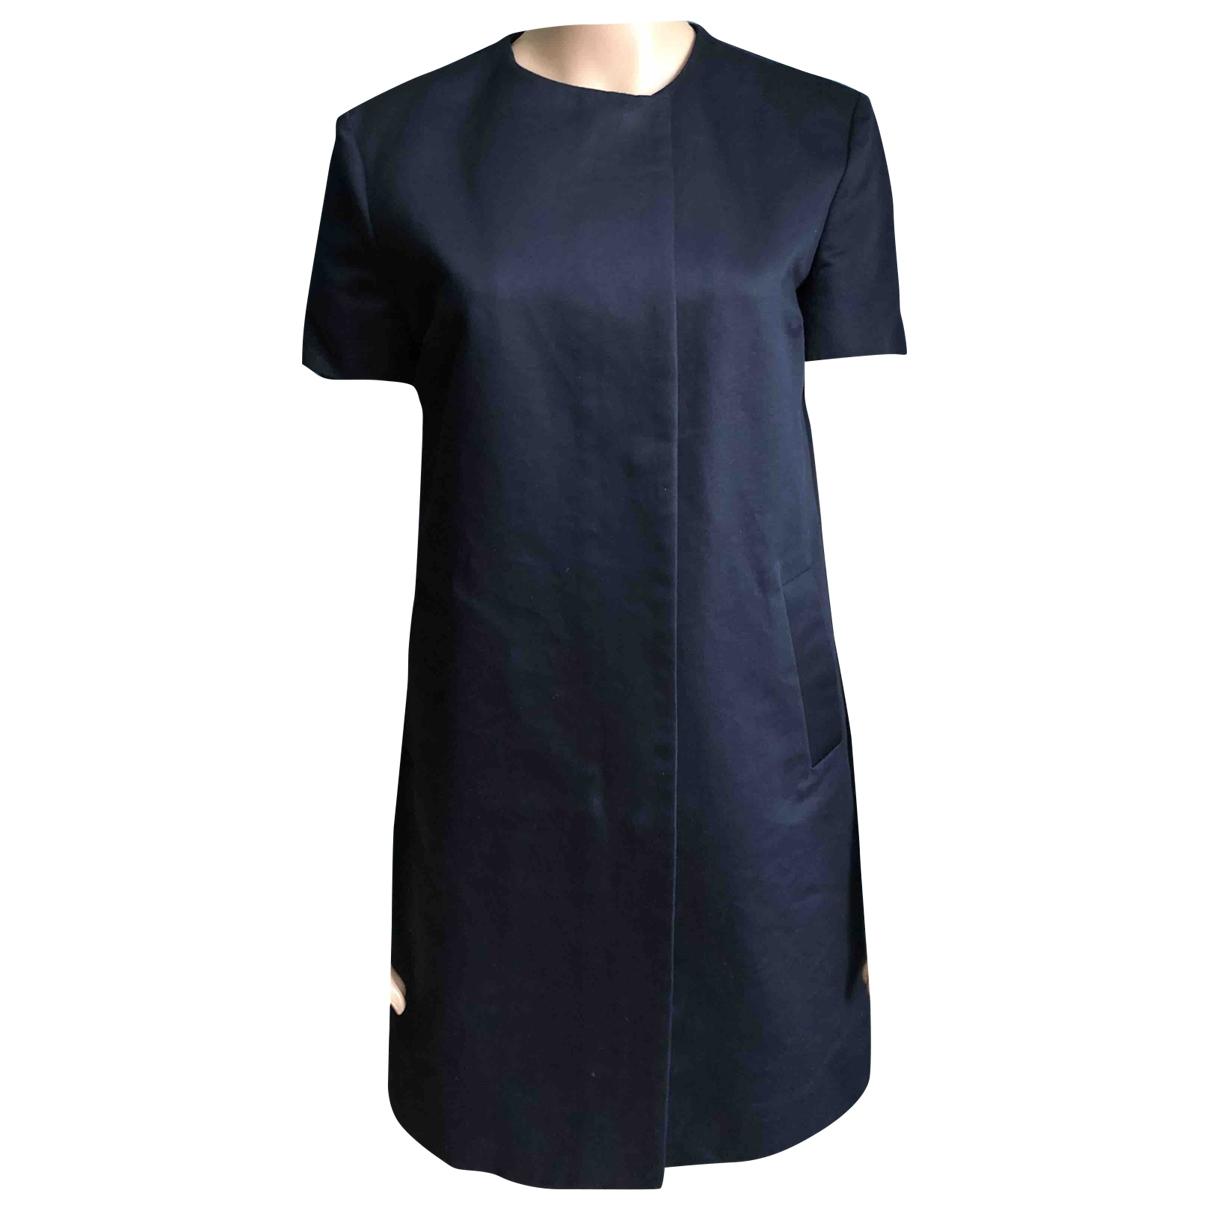 Victoria Beckham \N Blue Cotton jacket for Women 38 FR